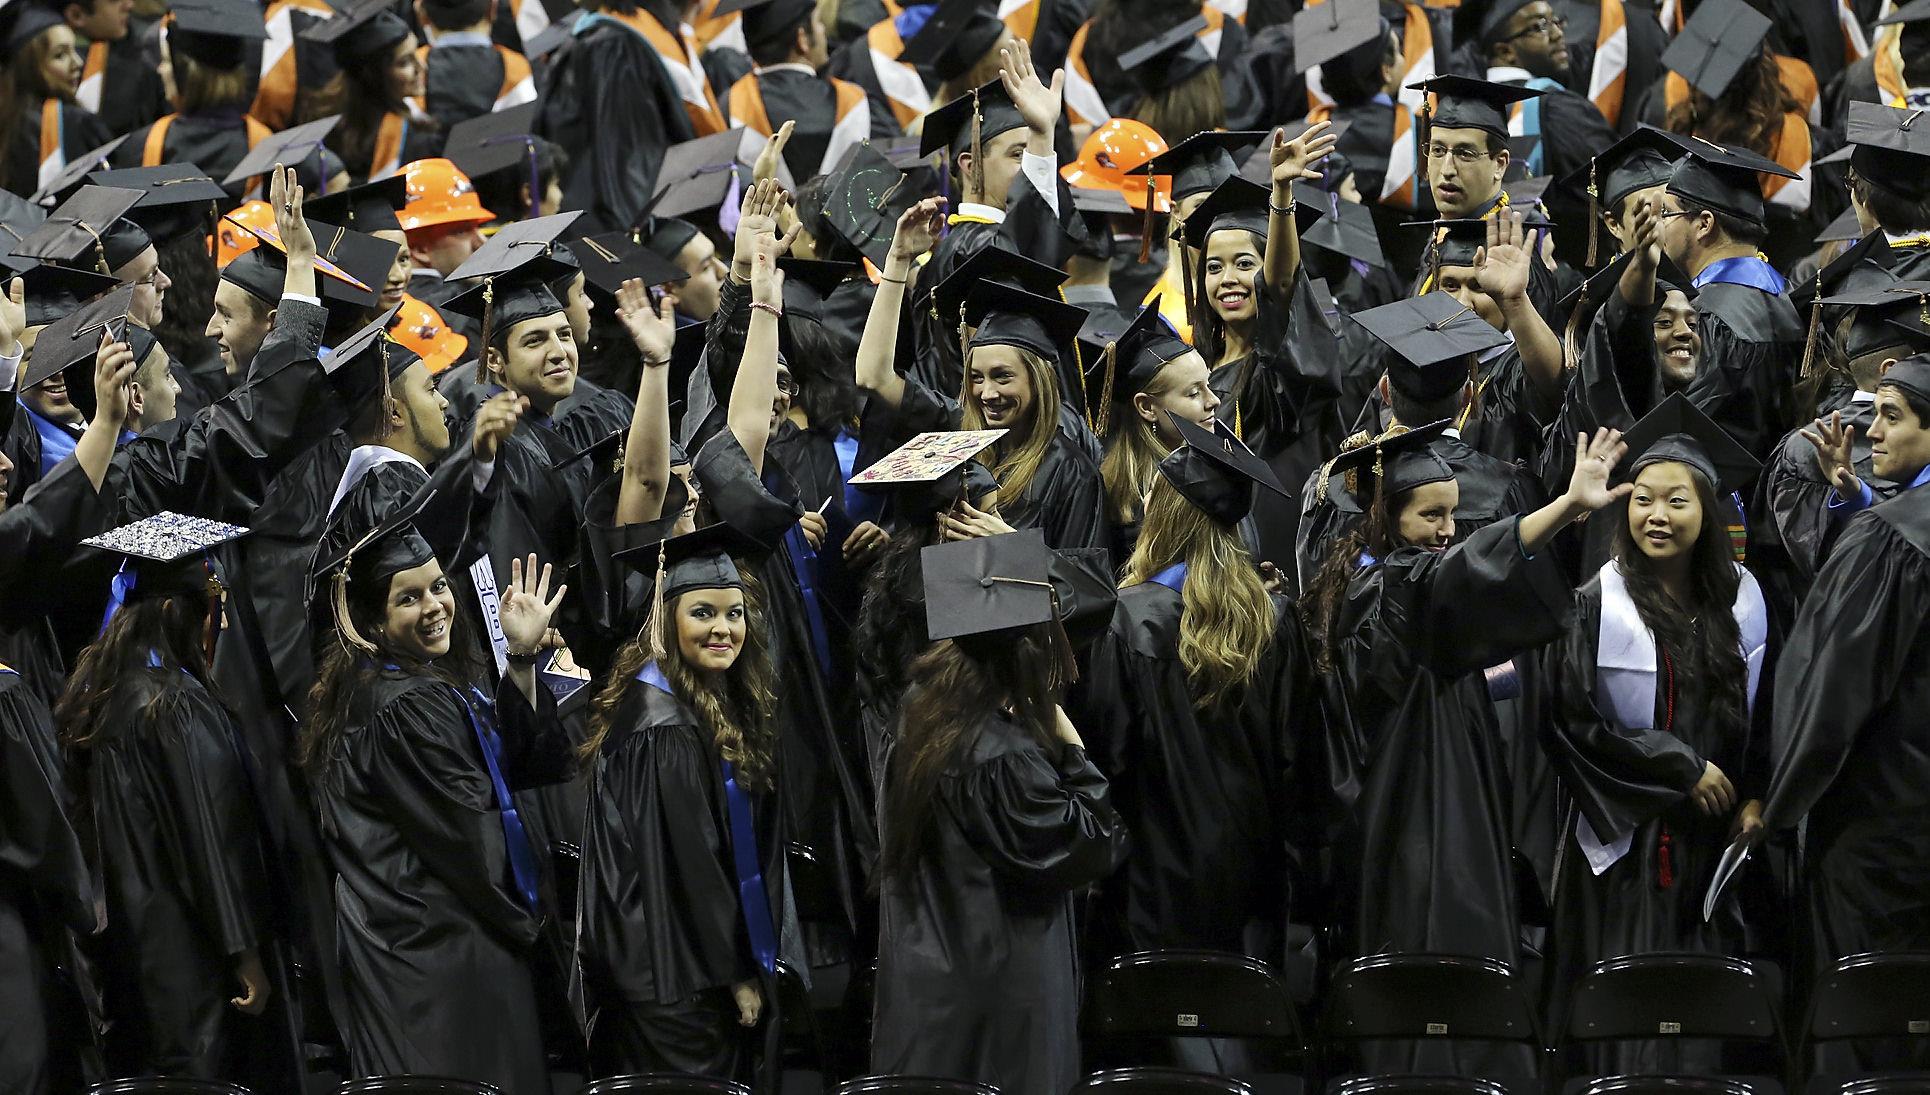 Best Graduation Pictures in San Antonio, TX - Yelp Graduation pictures san antonio